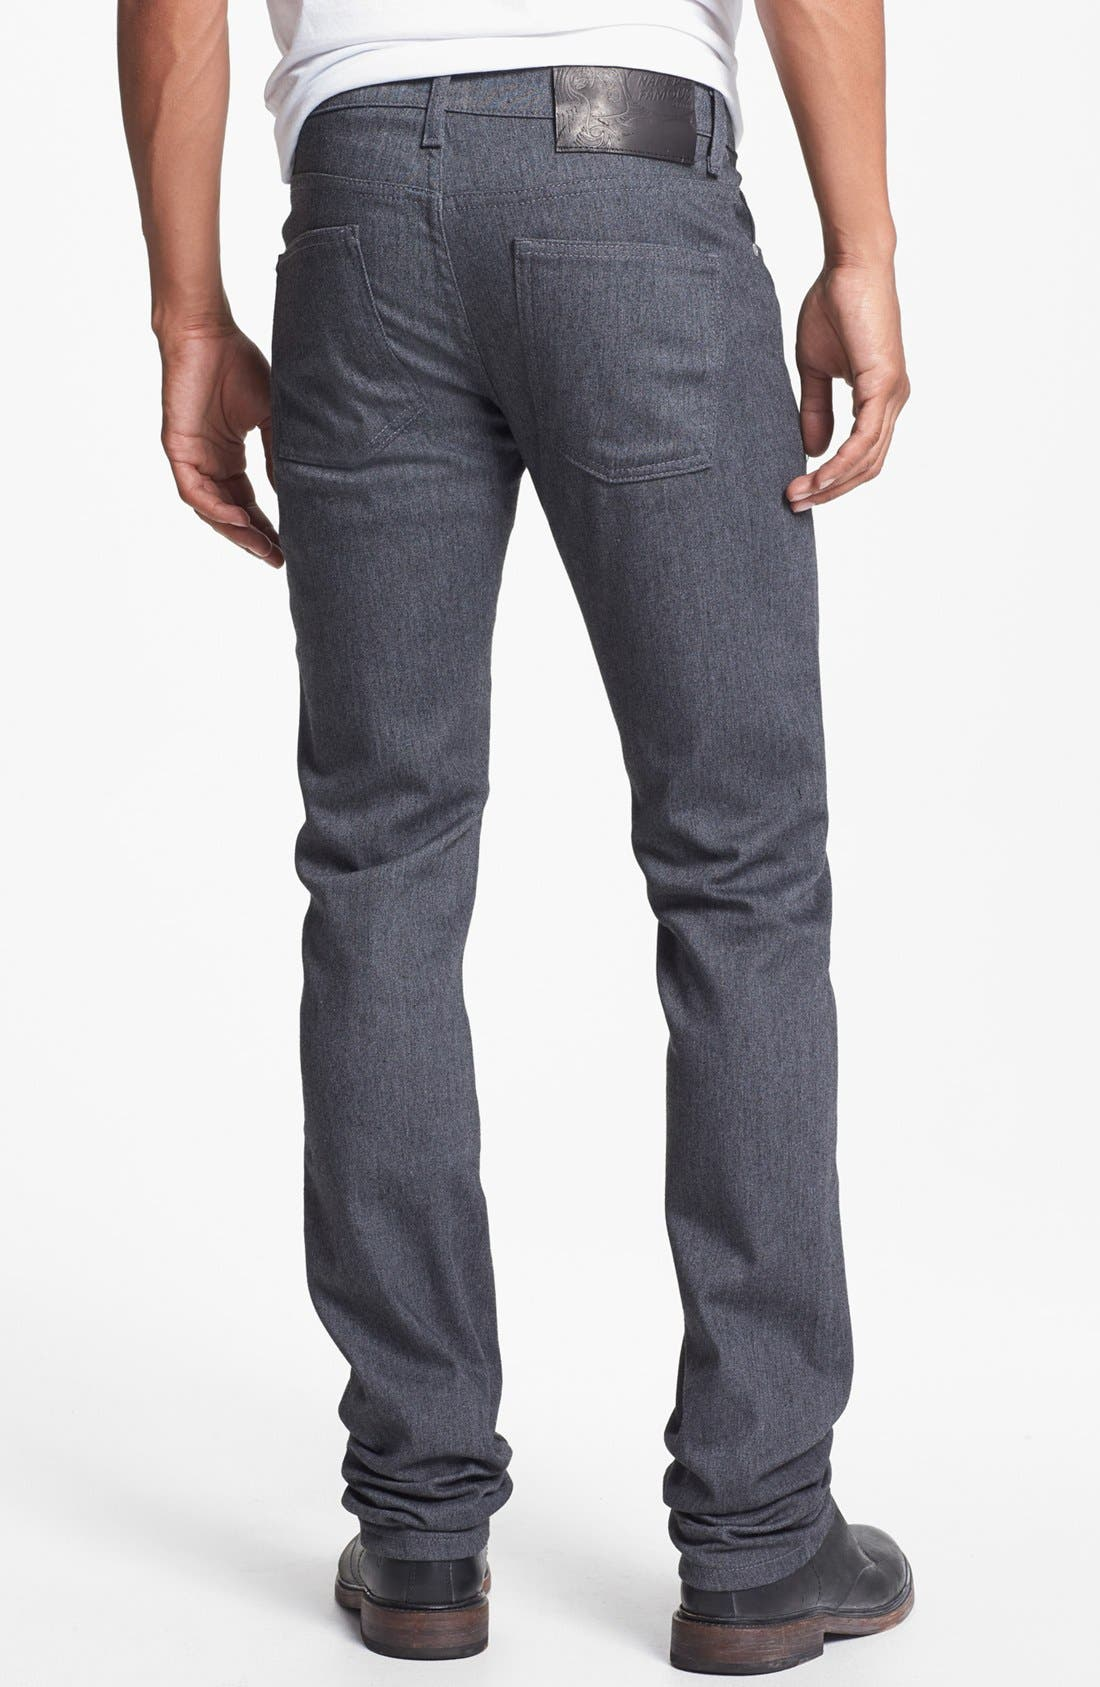 Main Image - Naked & Famous Denim 'Skinny Guy' Skinny Fit Jeans (Heather Grey Stretch)